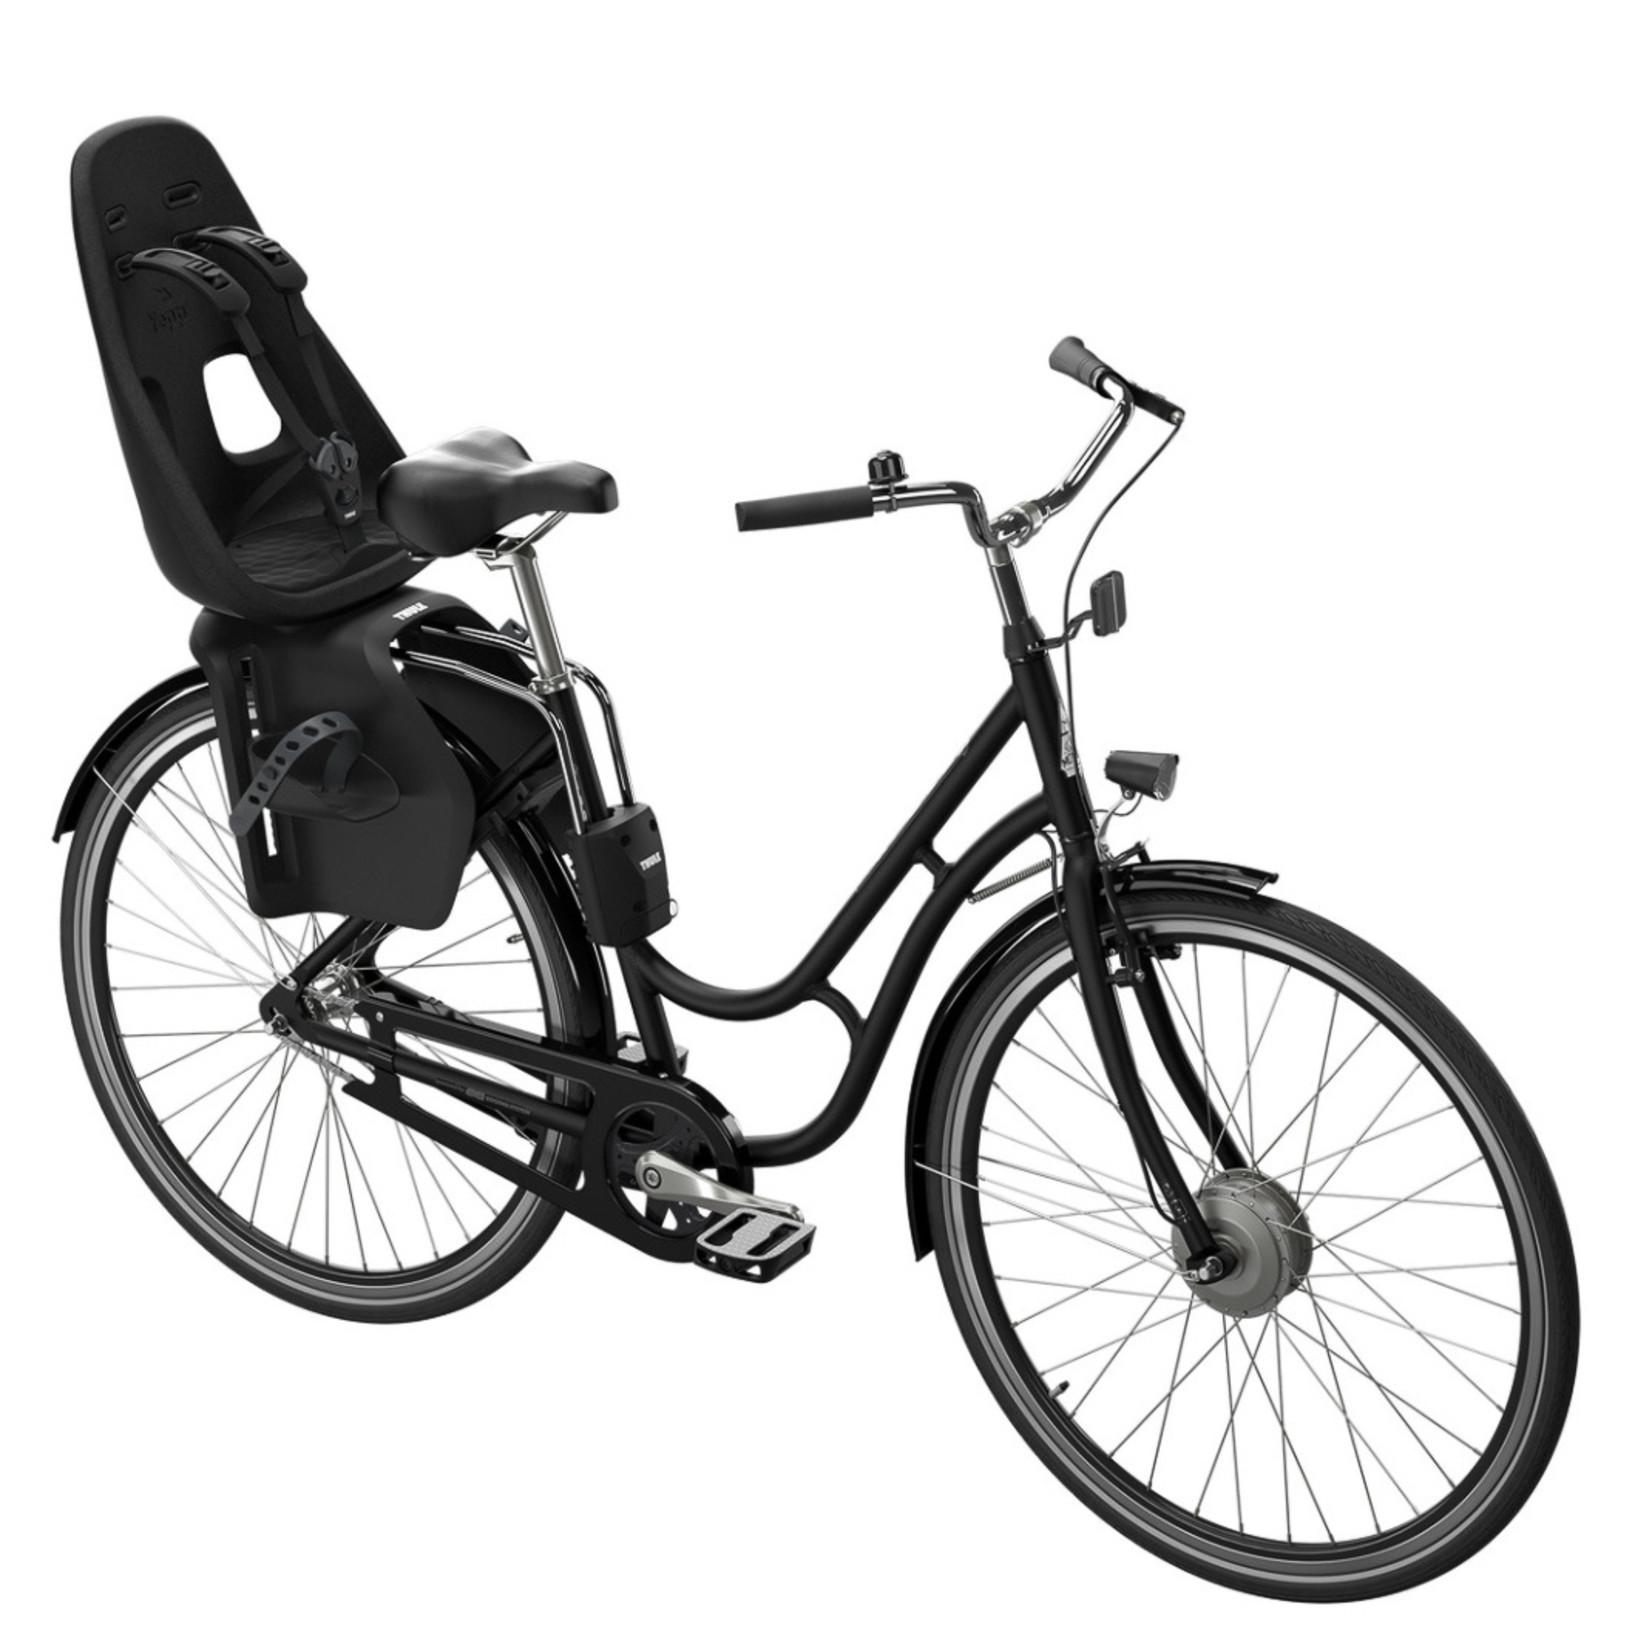 Thule Yepp Nexxt Maxi Rear Child Seat